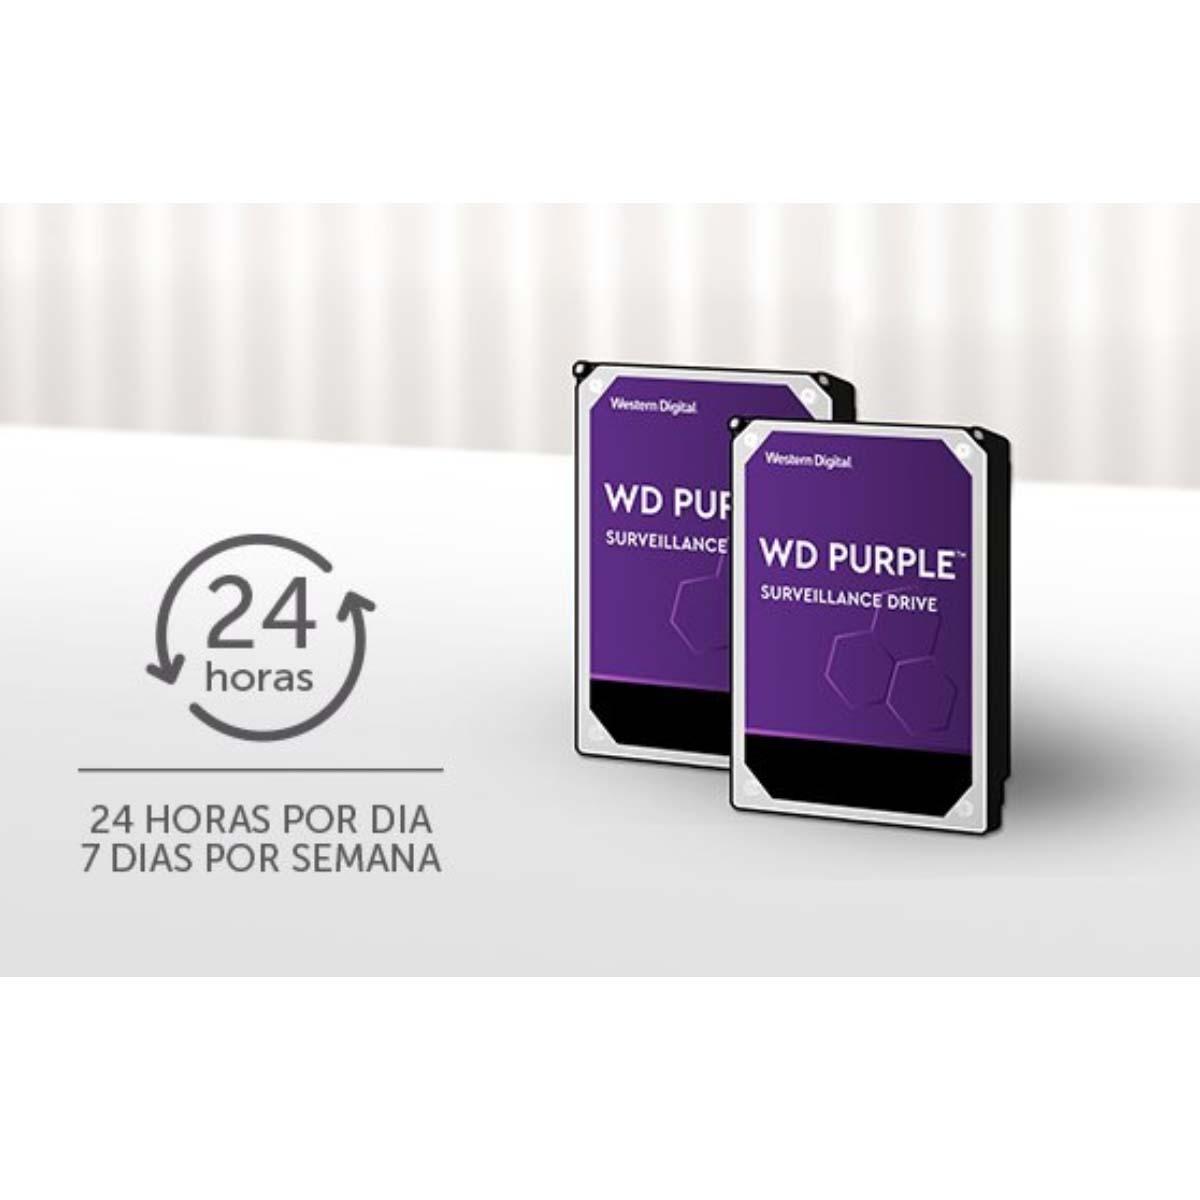 HD INTELBRAS DISCO RÍGIDO WD PURPLE 3 TERA PARA CFTV